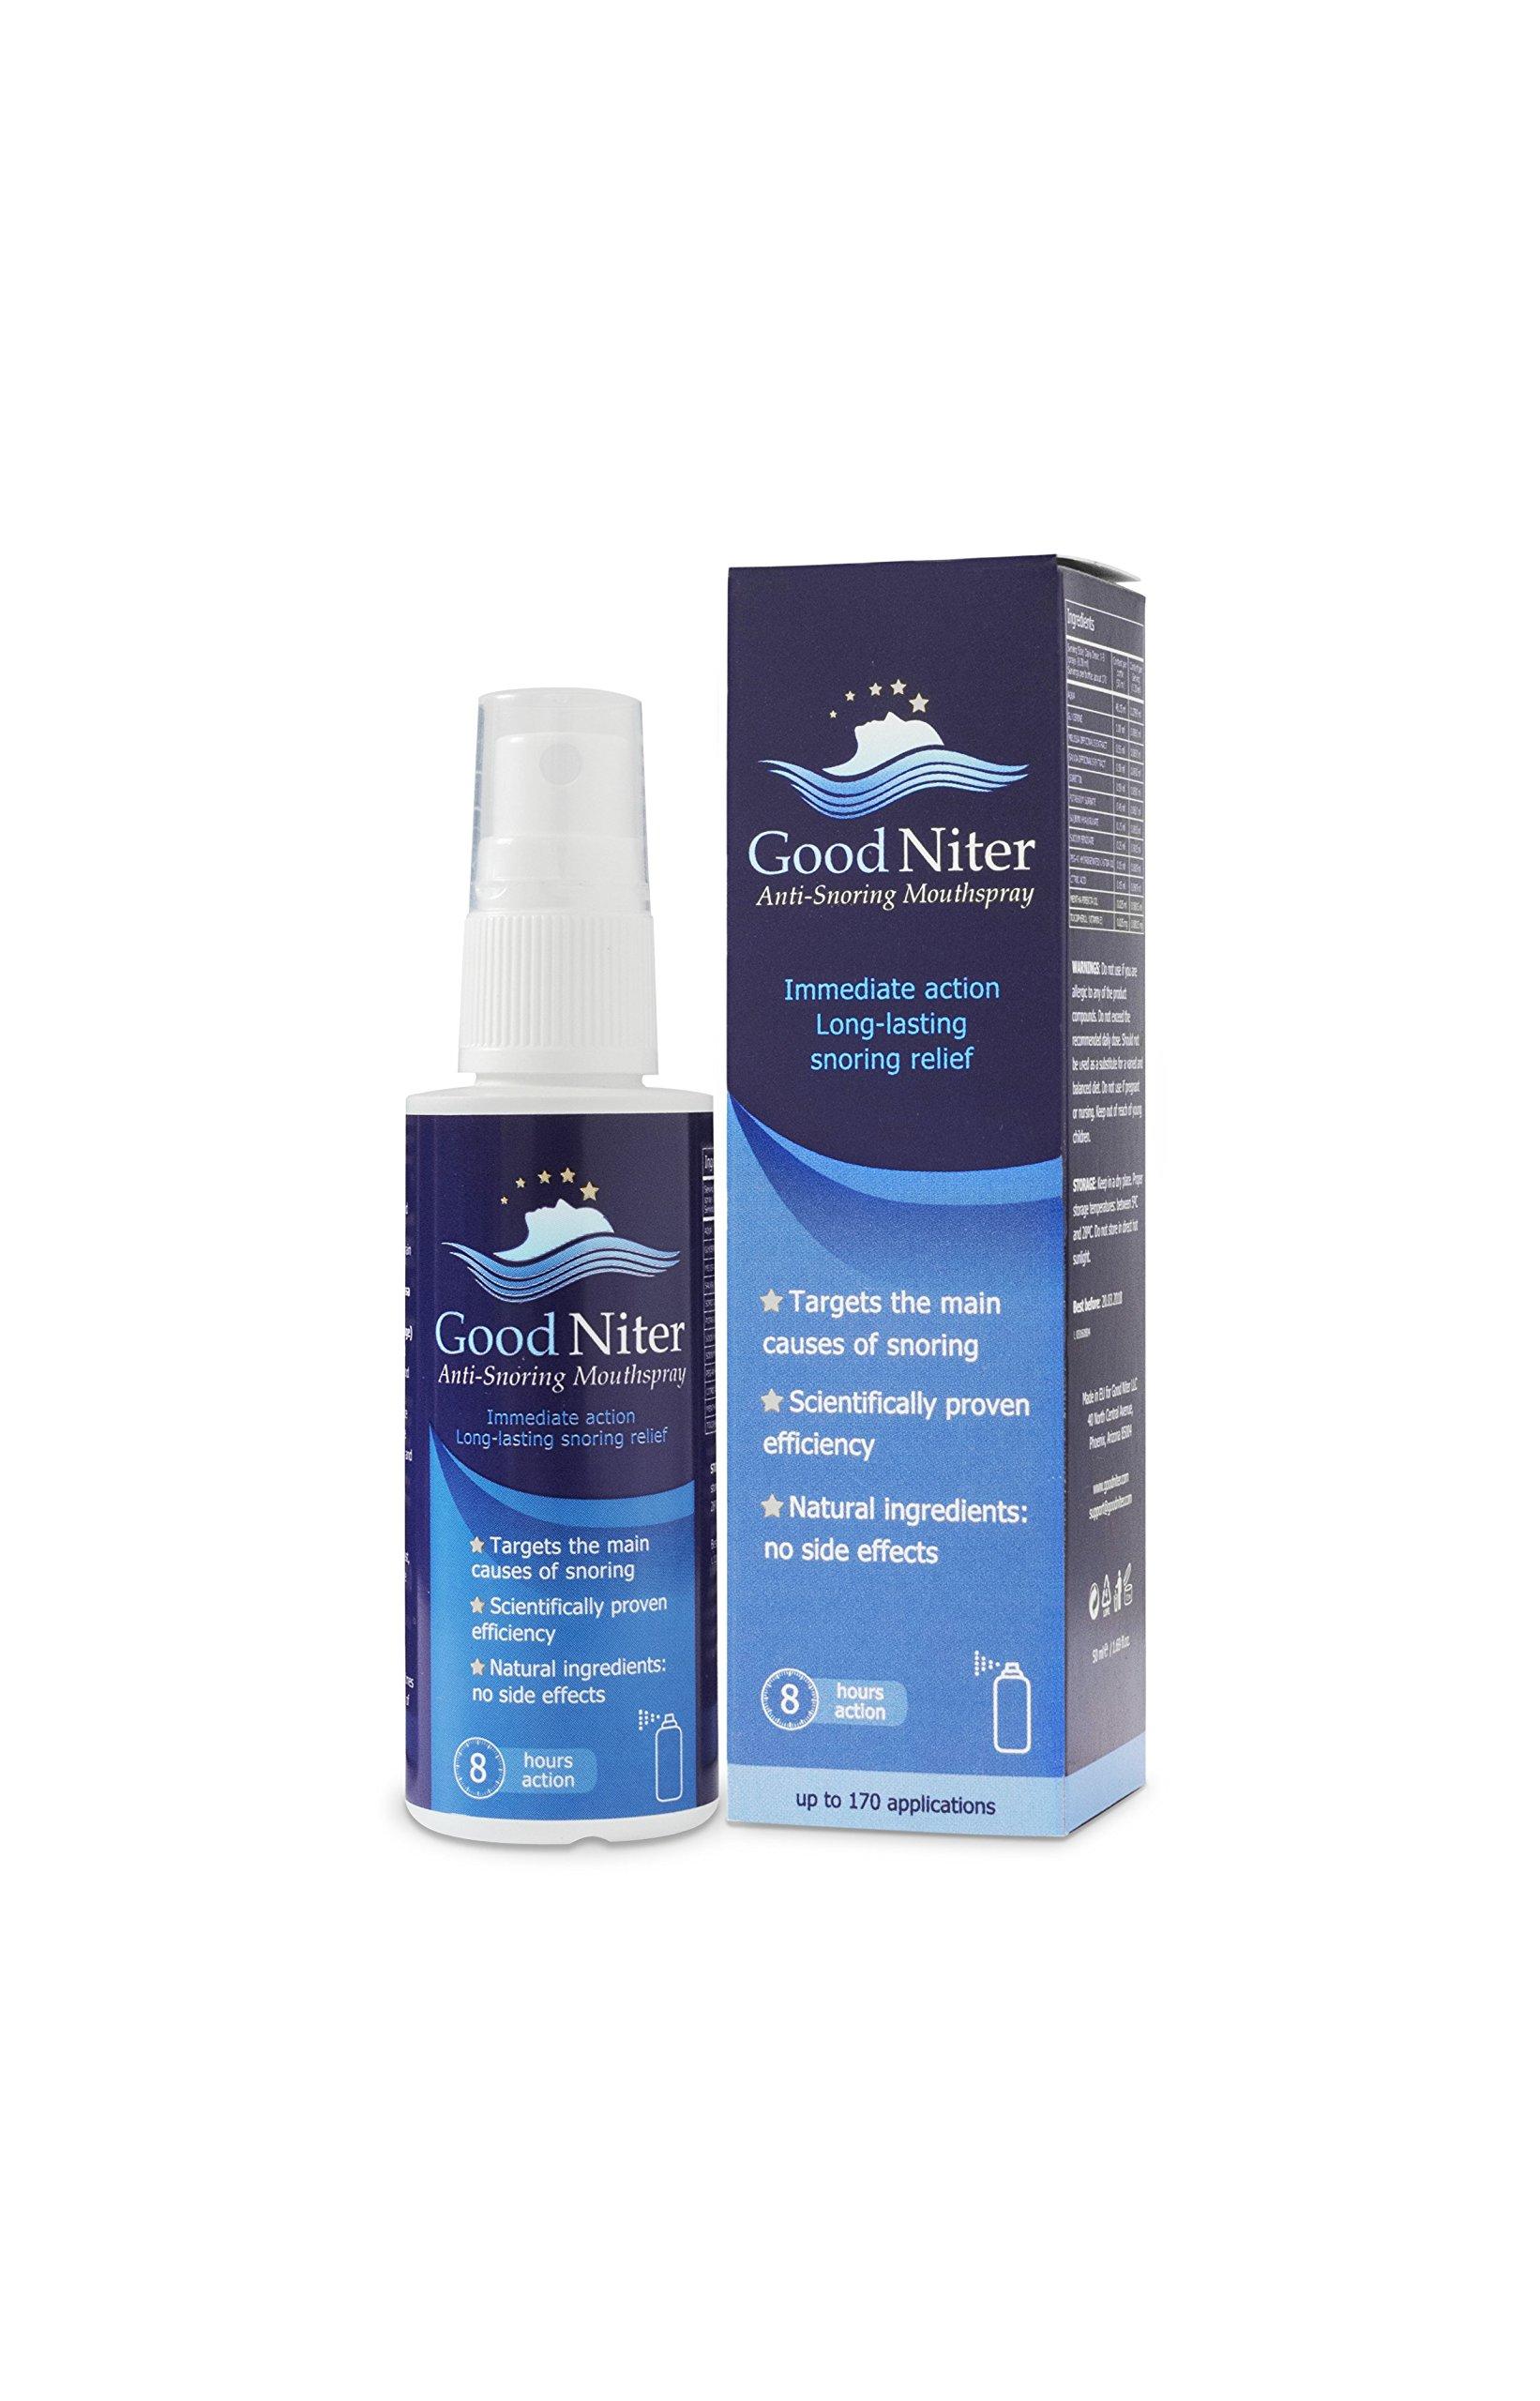 Goodniter Spray, Goodniter Anti-snoring Spray, Oral Health, Mouth Wash